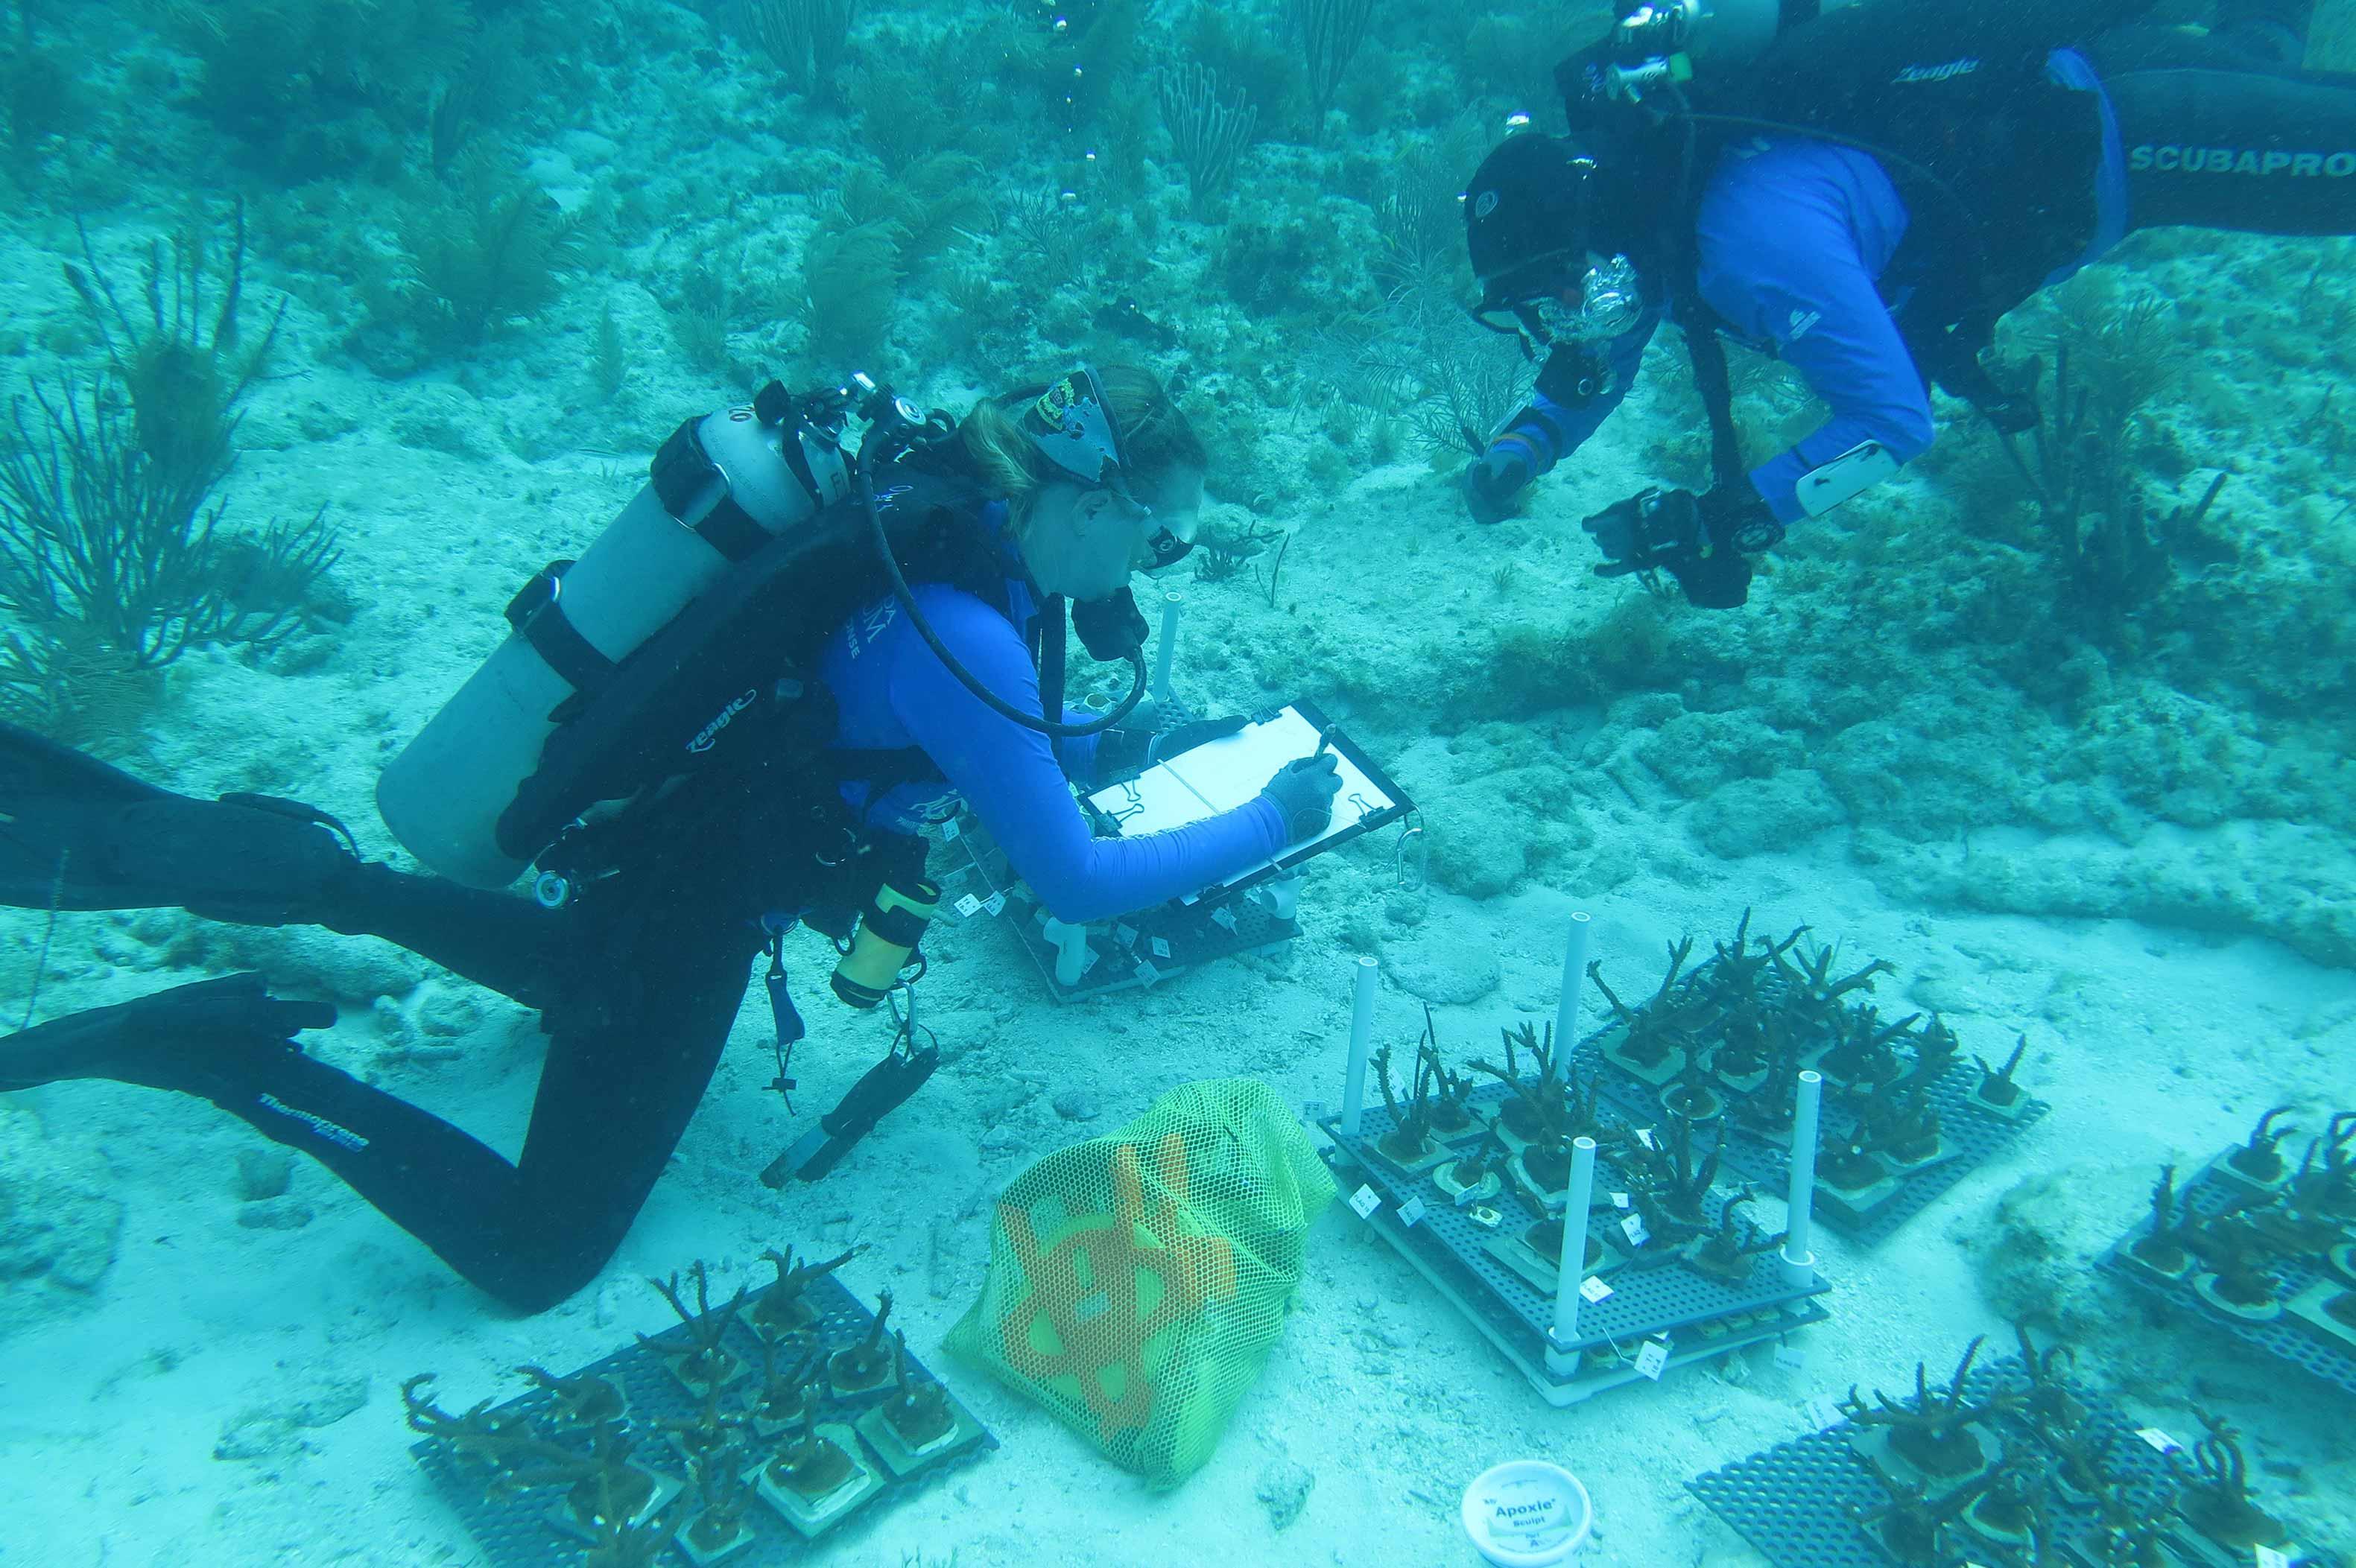 Coral outplant diving. Credit The Florida Aquarium